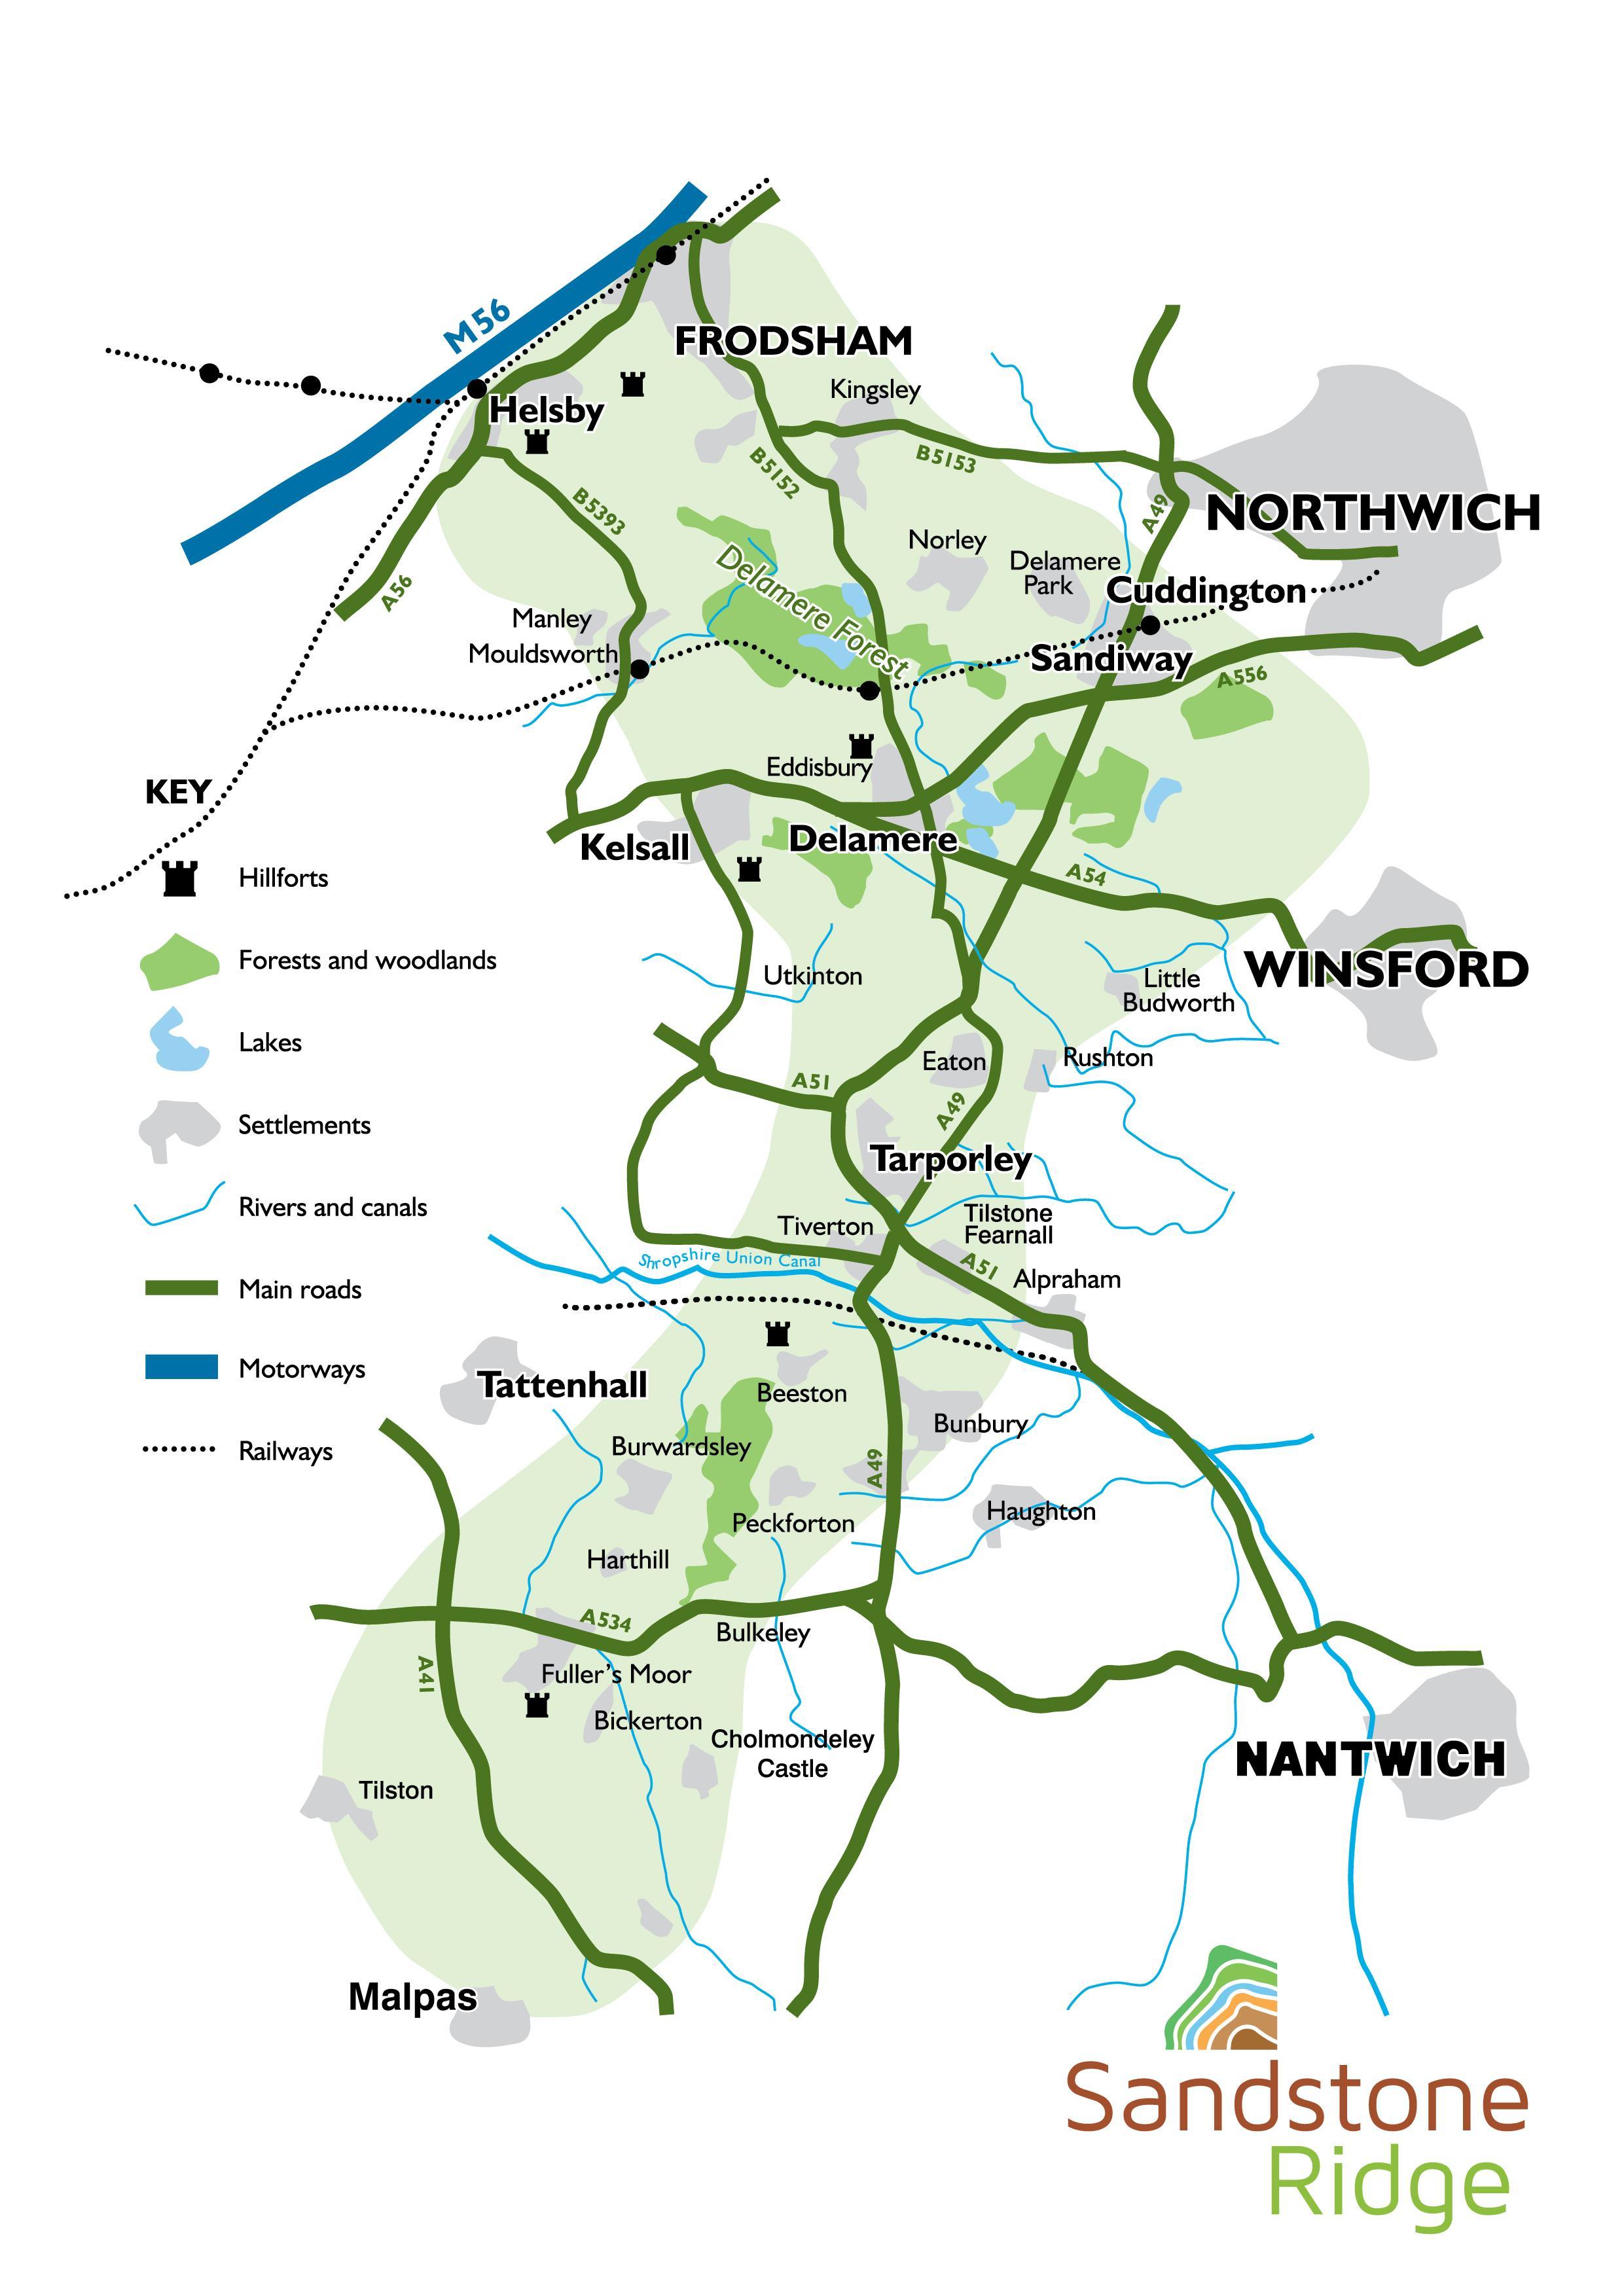 Sandstone Ridge detailed map